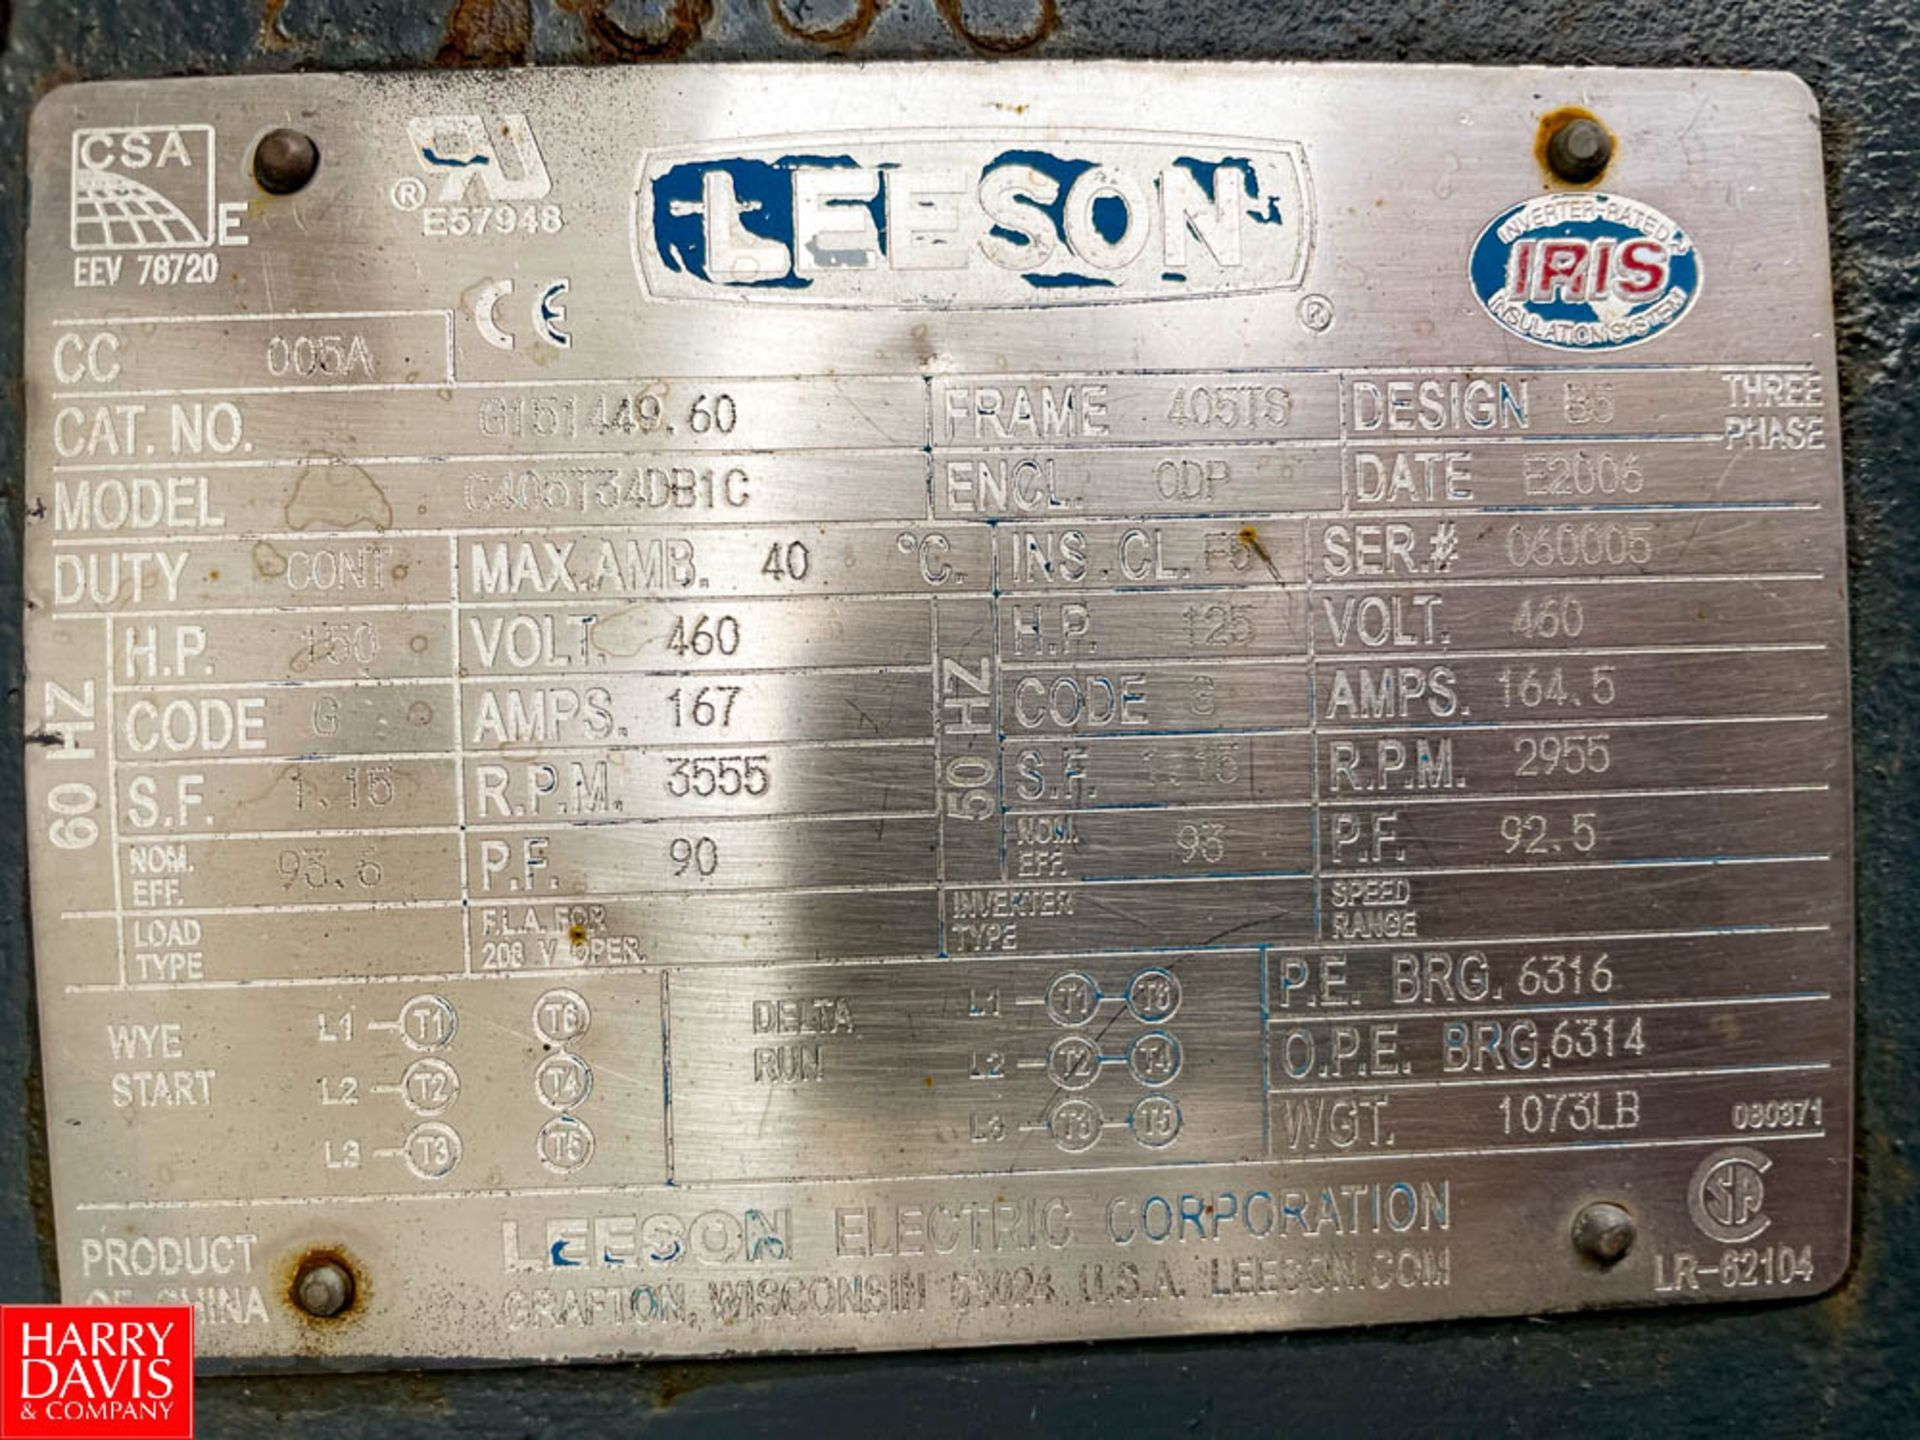 Leeson 150 HP 3,555 RPM Motor. Rigging Fee: $ 125 - Image 3 of 3